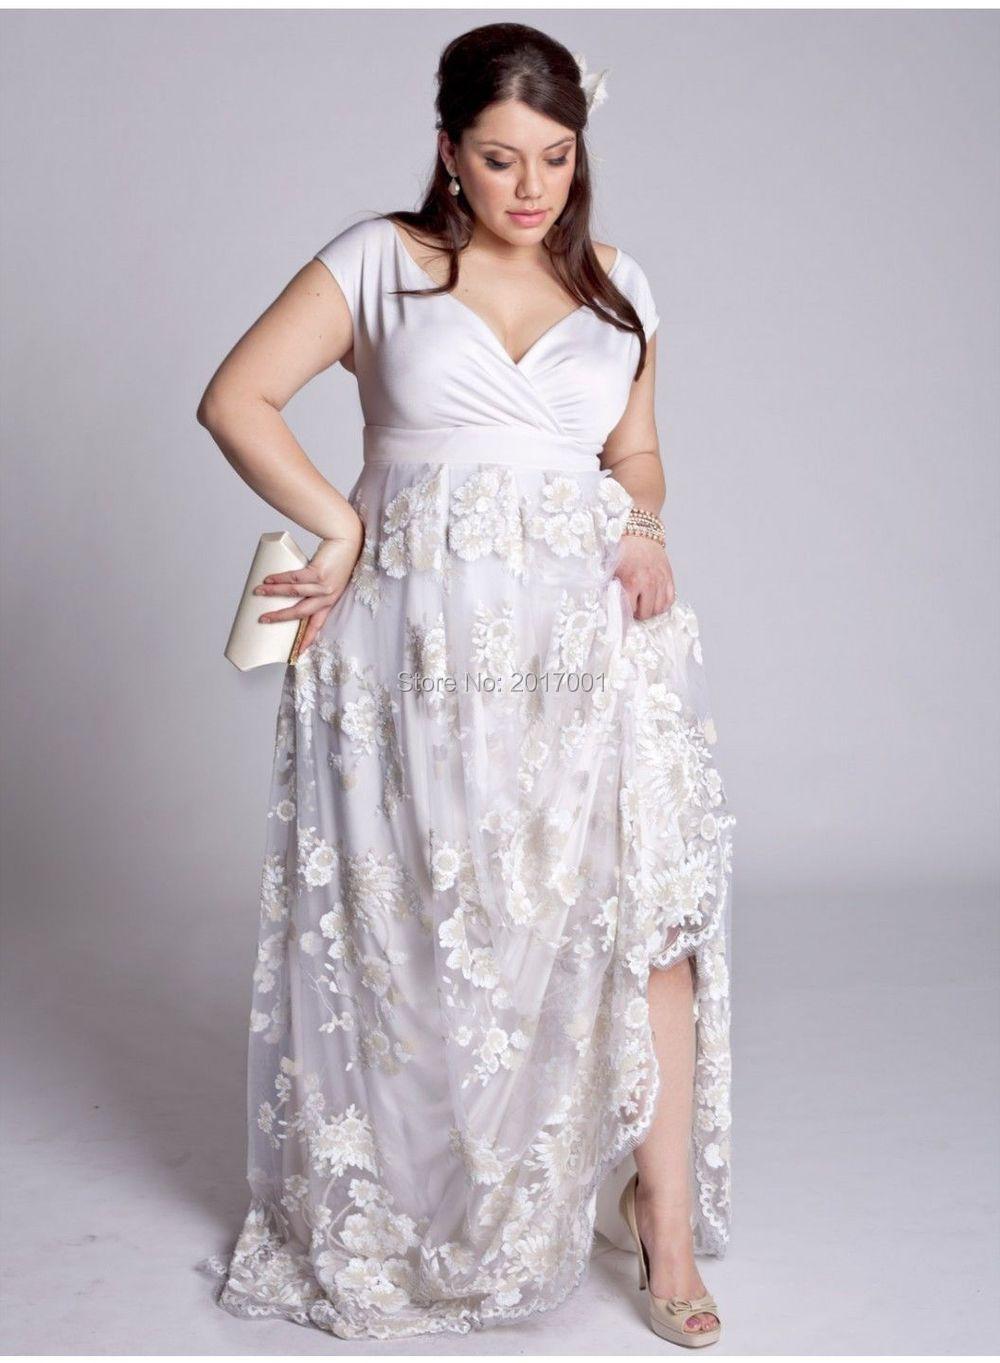 elegant tank wedding dresses plus size 2015 satin and appliques champagne of ribbon for big women